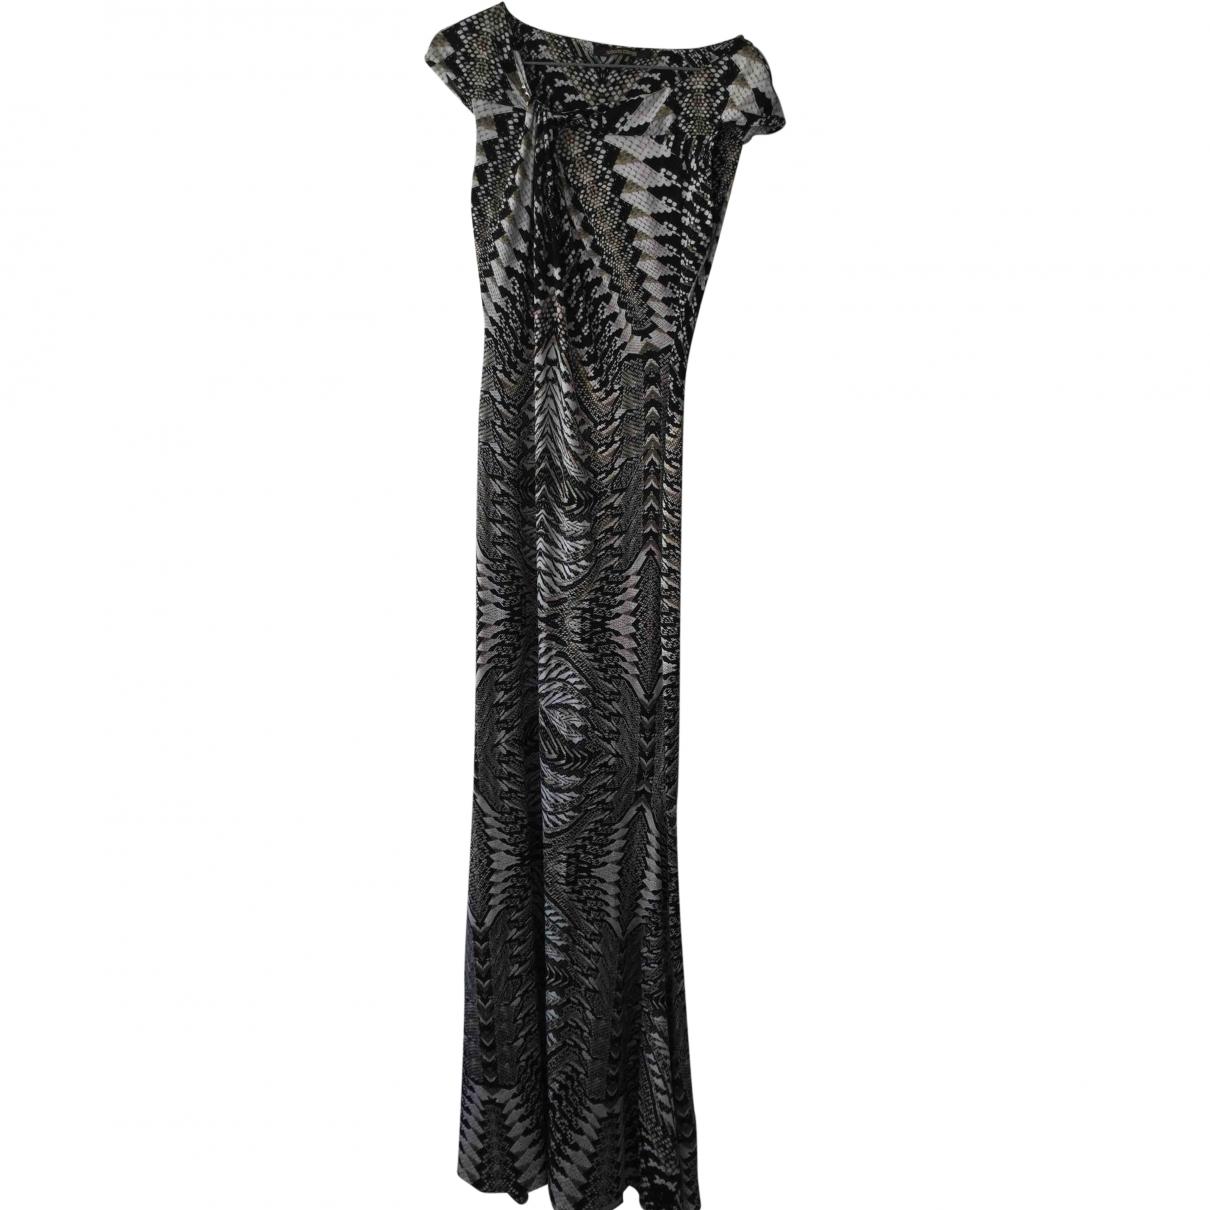 Roberto Cavalli \N Metallic dress for Women 38 FR